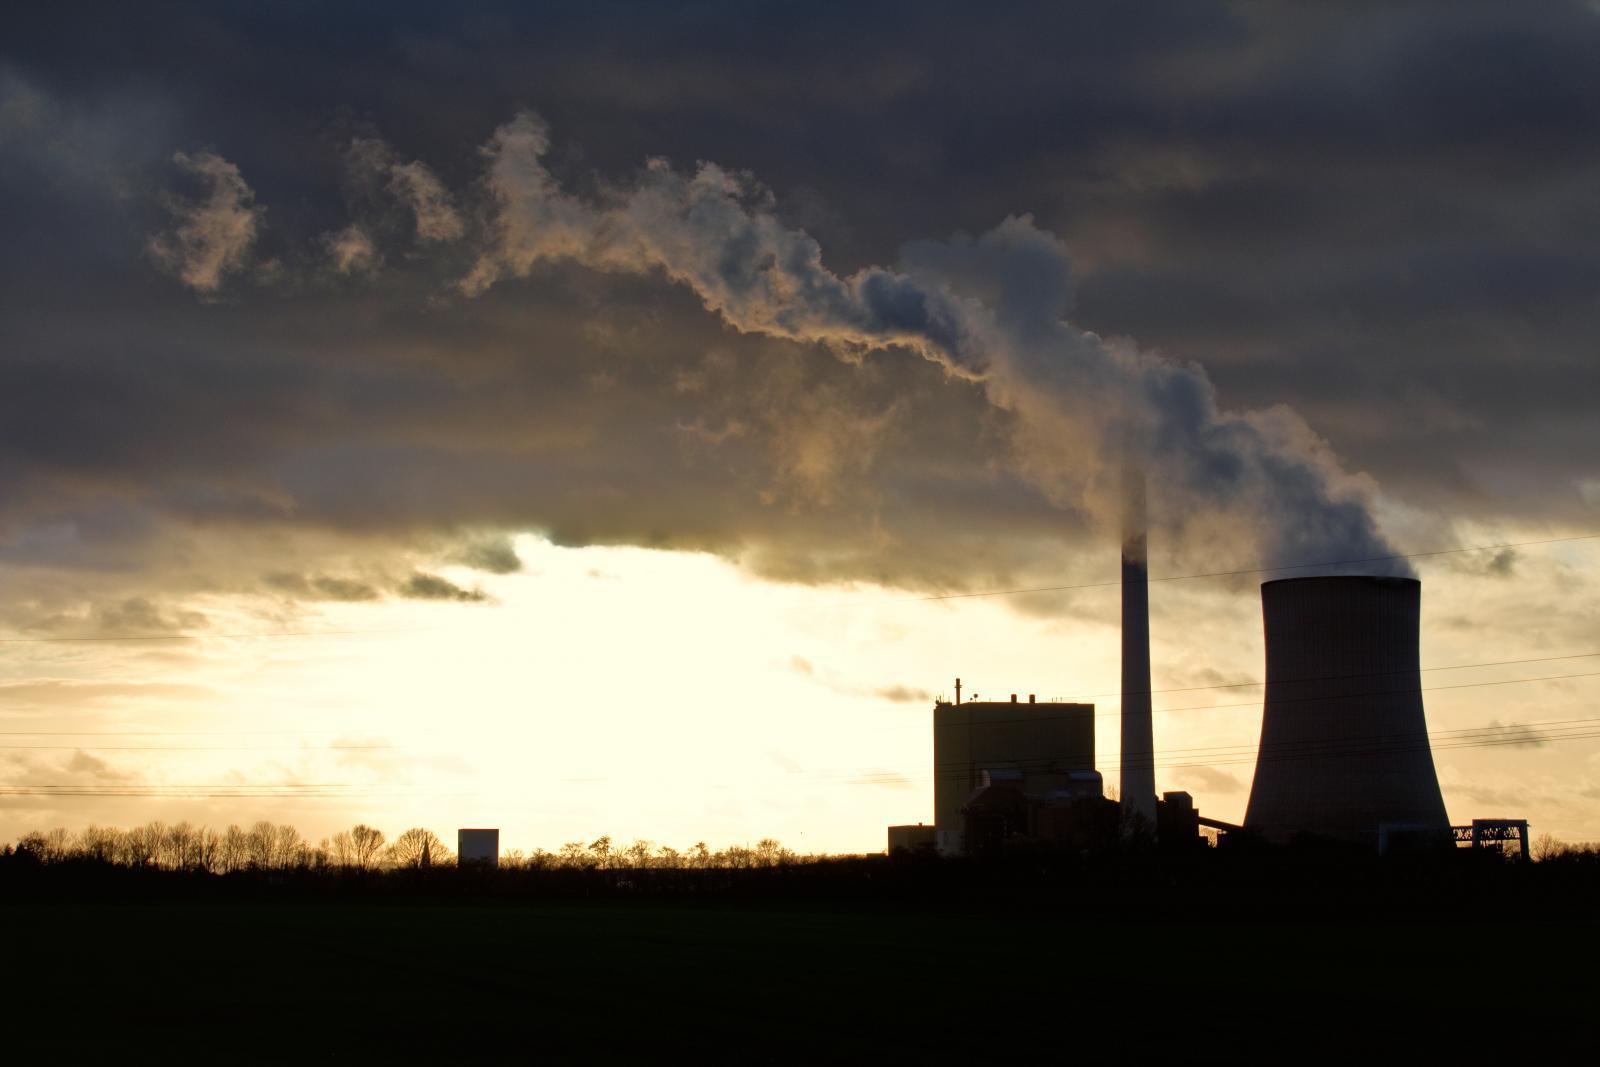 climate change , โลกร้อน , โควิด-19  , ไวรัสโคโรนา  , มลภาวะ  , COVID-19  , คาร์บอนไดออกไซด์ , ชีวิตวิถีใหม่ , ความปกติใหม่ , New Normal , พลังงาน  , ราคาน้ำมัน  , การใช้ไฟฟ้า